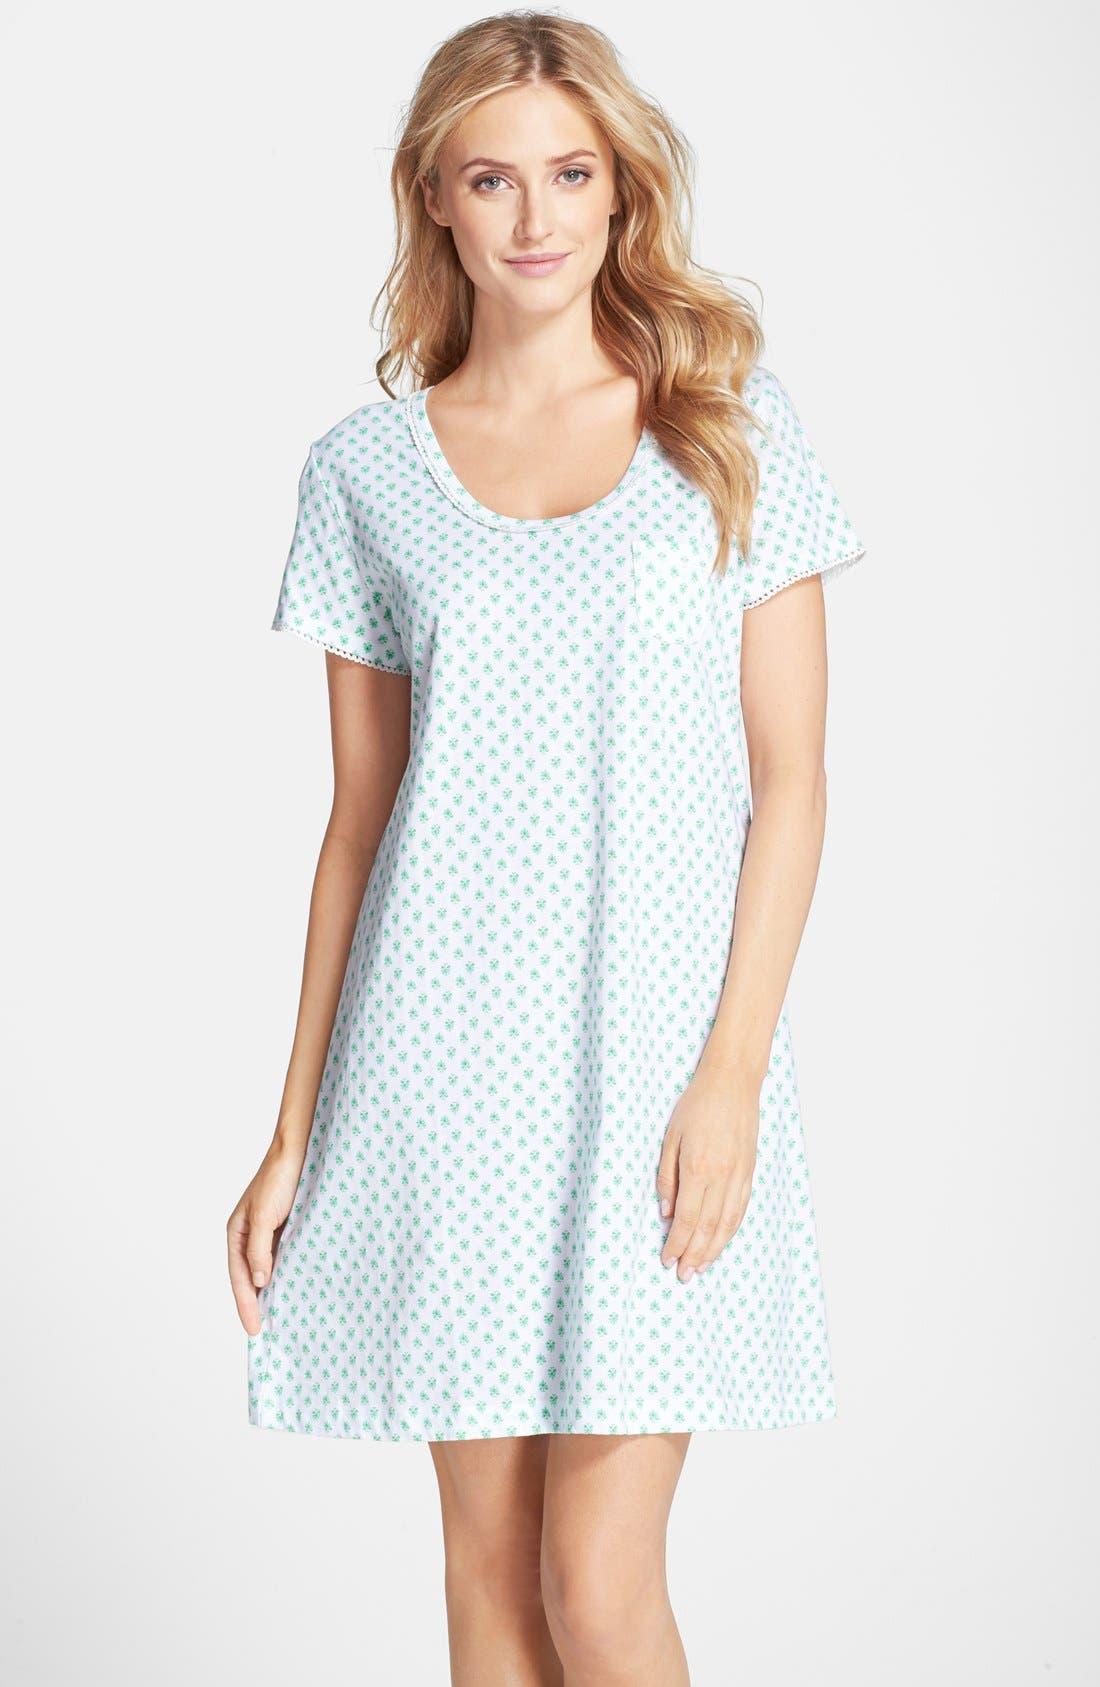 Main Image - Carole Hochman Designs Print Cotton Jersey Sleep Shirt